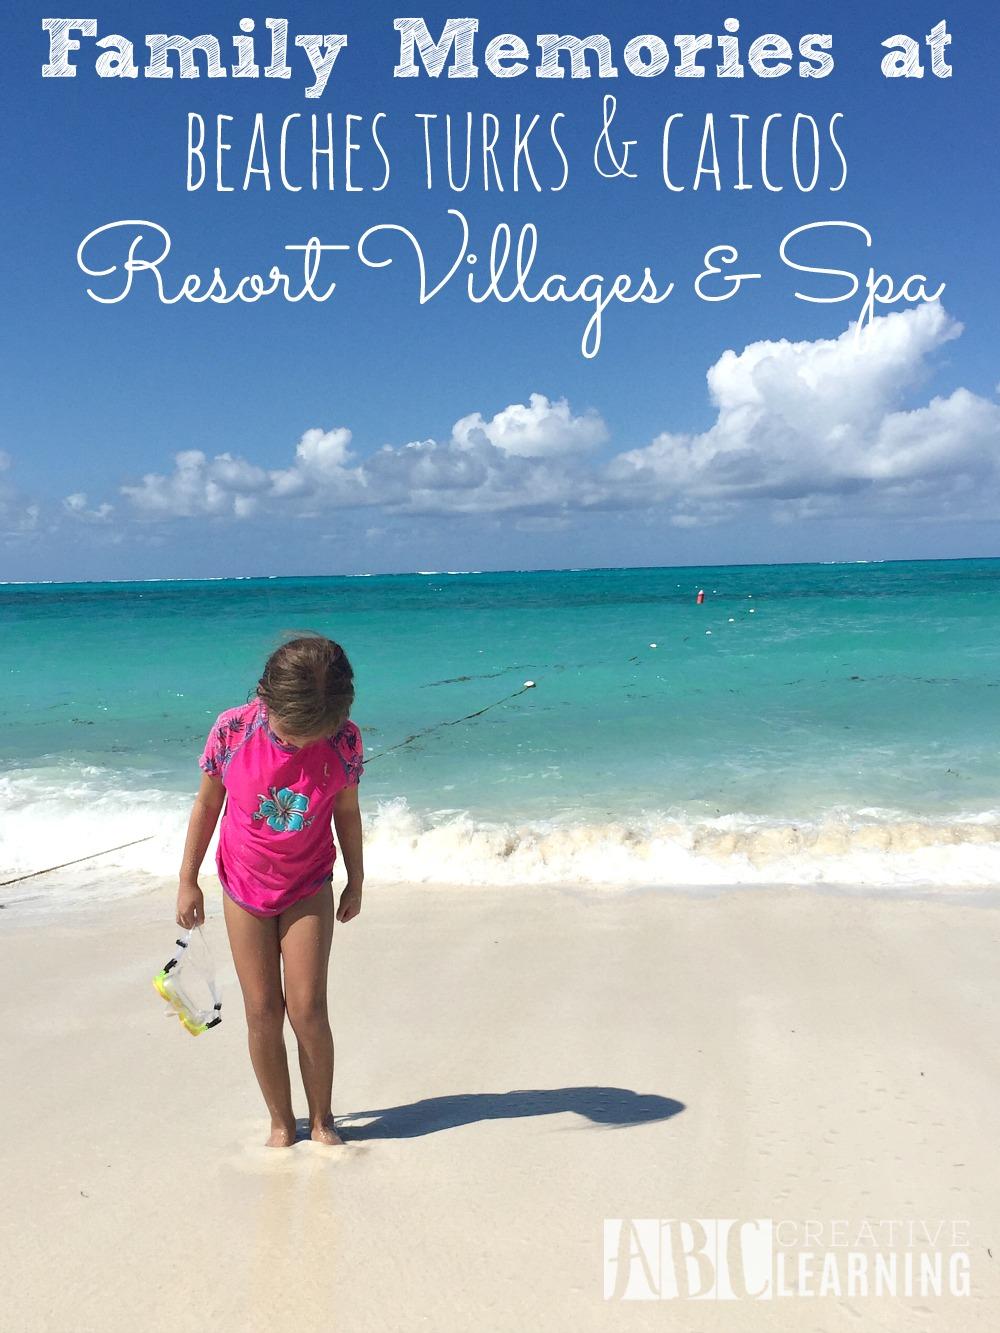 Family Memories at Beaches Turks & Caicos Resort Villages & Spa